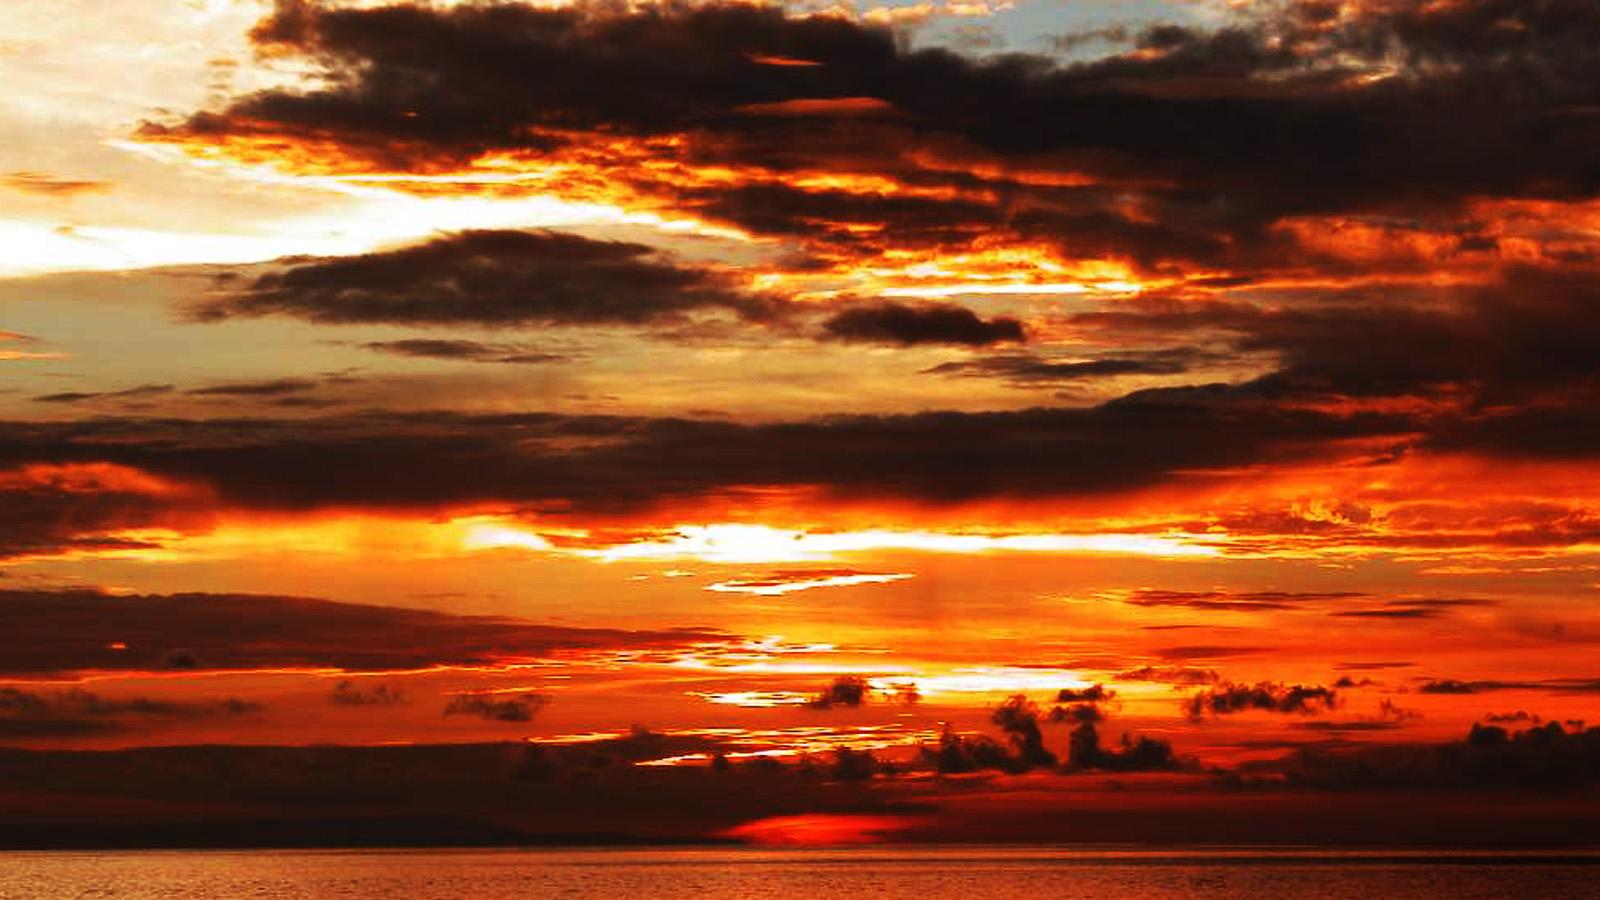 http://4.bp.blogspot.com/-z5ygI_Ibgzc/Tsz5NVPMhrI/AAAAAAAAA08/pe507tG7RuE/s1600/senggigi-beach-sunset-wallpapers.jpg